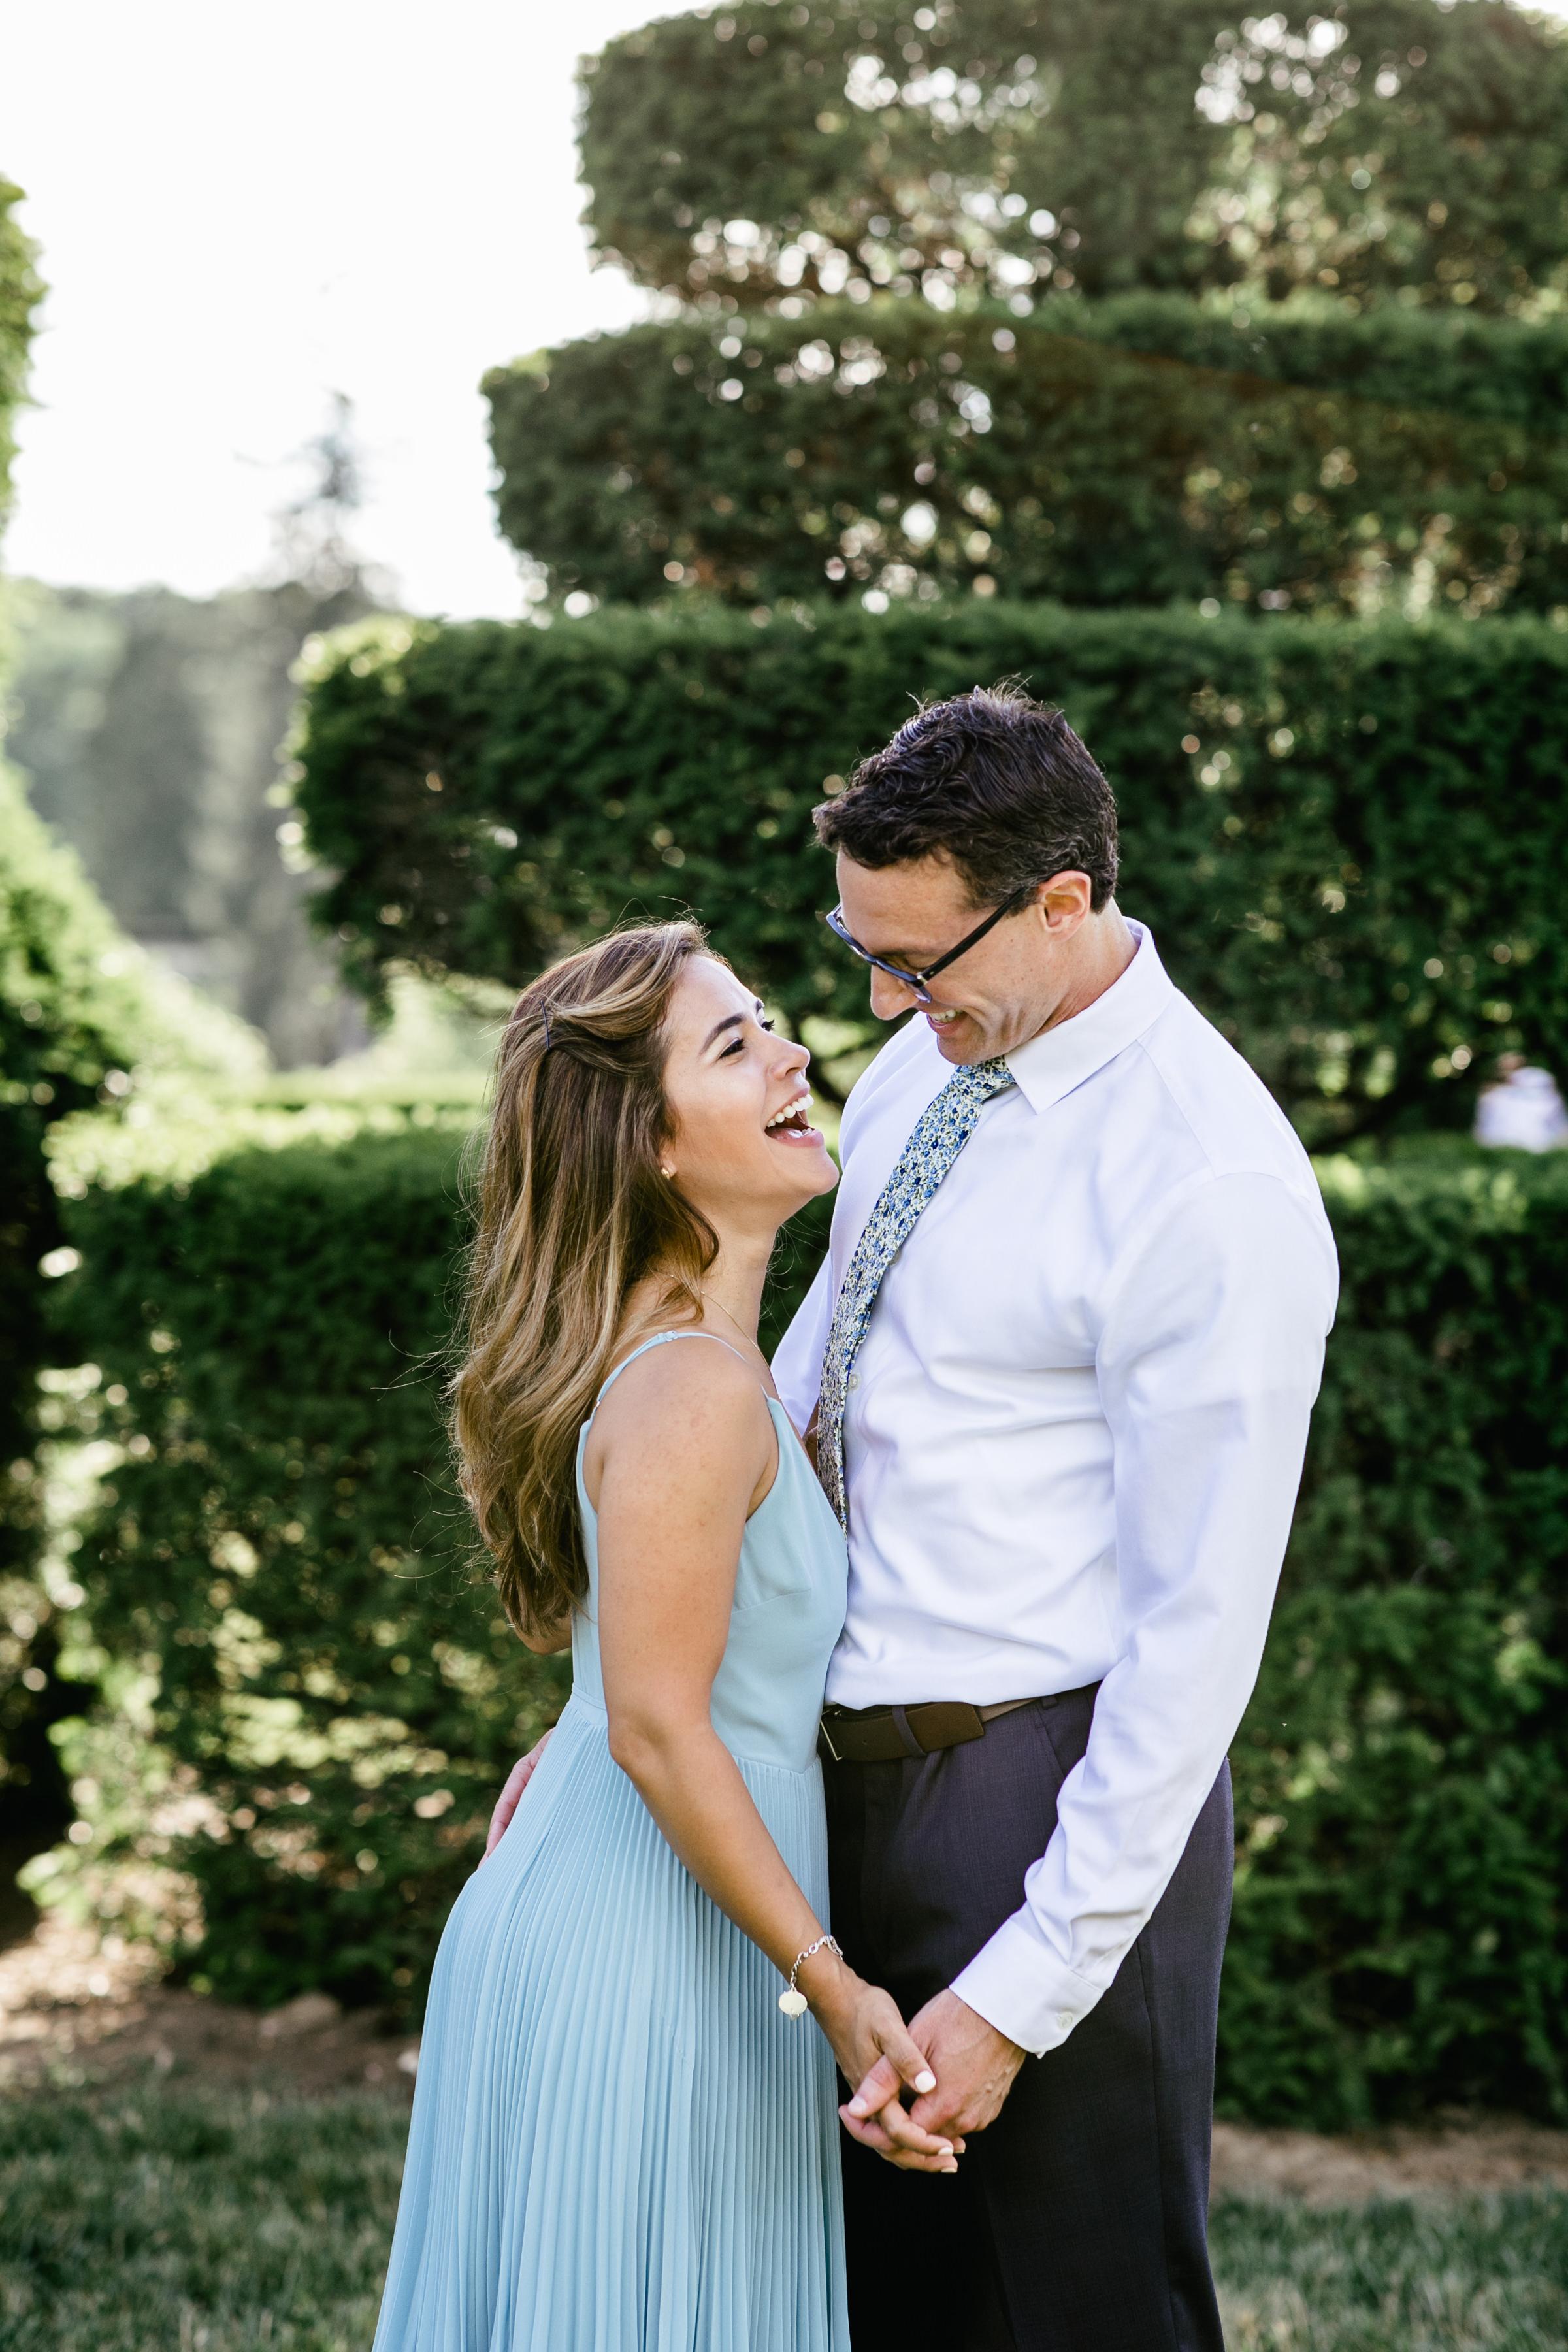 photography-natural-candid-engaged-proposal-philadelphia-wedding-longwood gardends-nature-flowers-modern-lifestyle-22.JPG